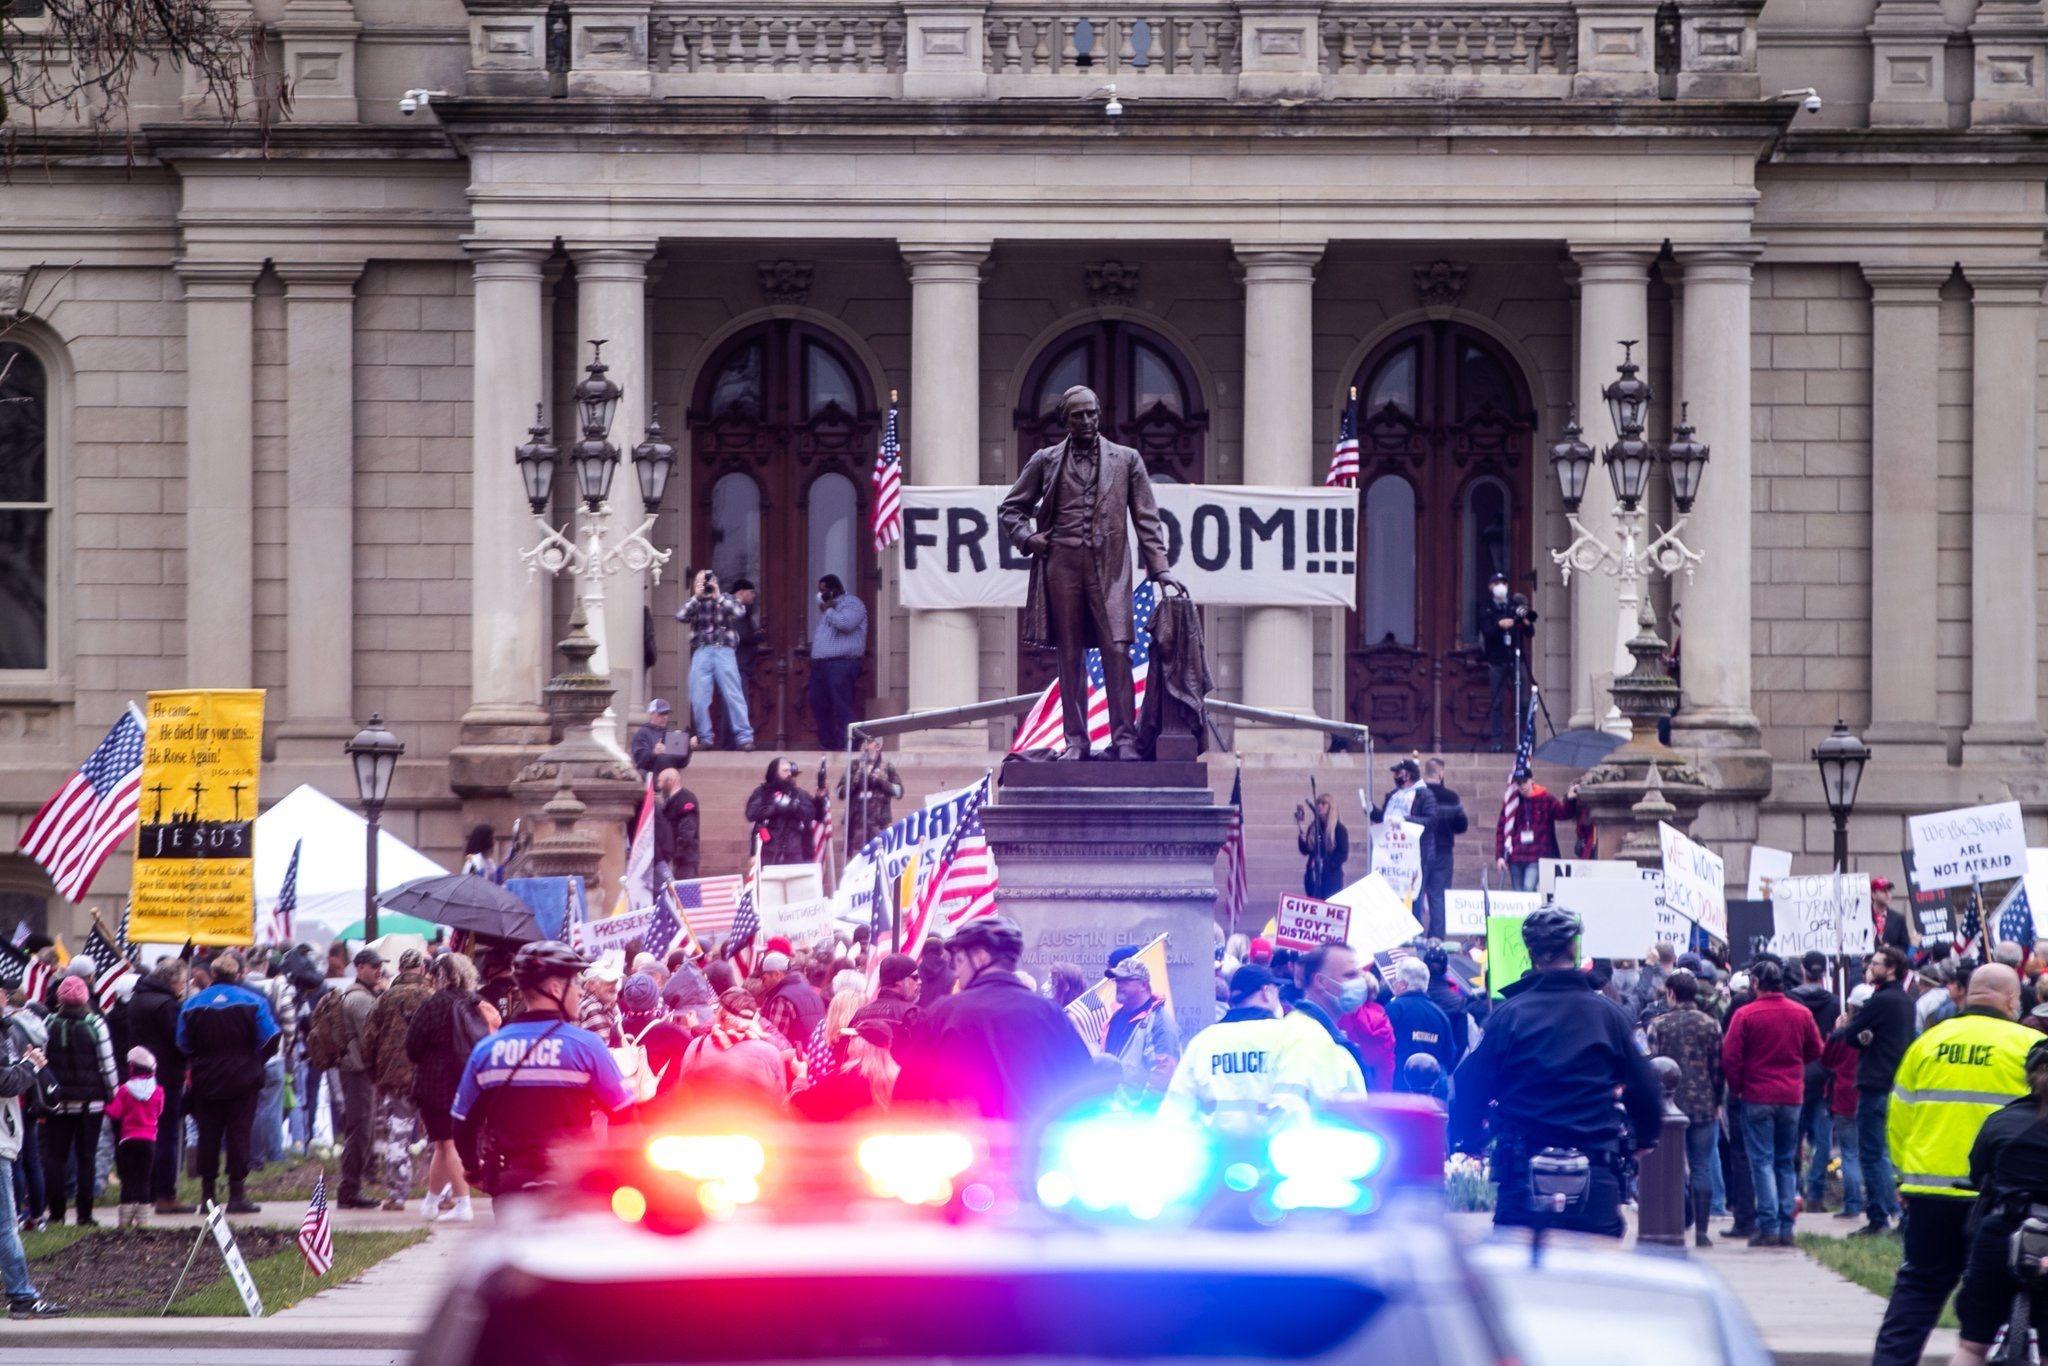 Michigan Statehouse Protests May 1 2020 Michigan Landmarks Travel